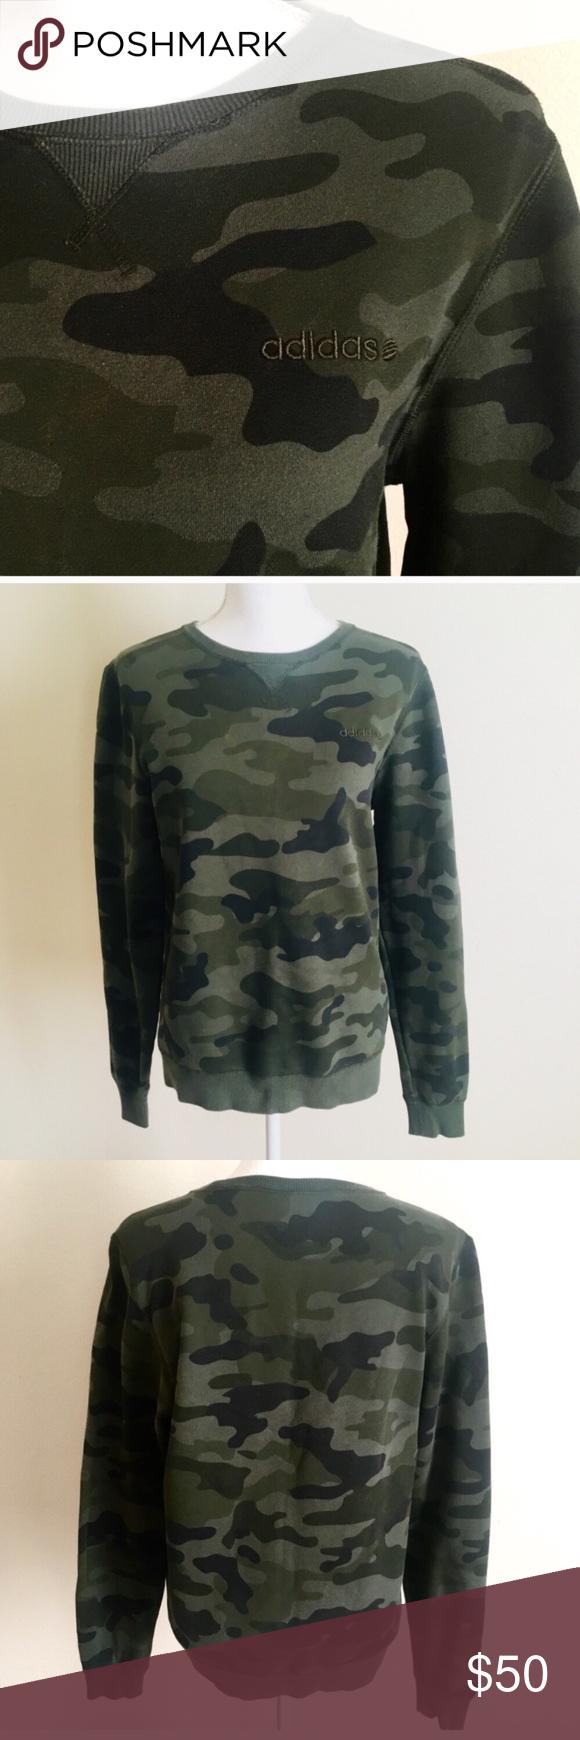 Adidas Camo Sweatshirt Camo Sweatshirt Adidas Camo Sweatshirts [ 1740 x 580 Pixel ]